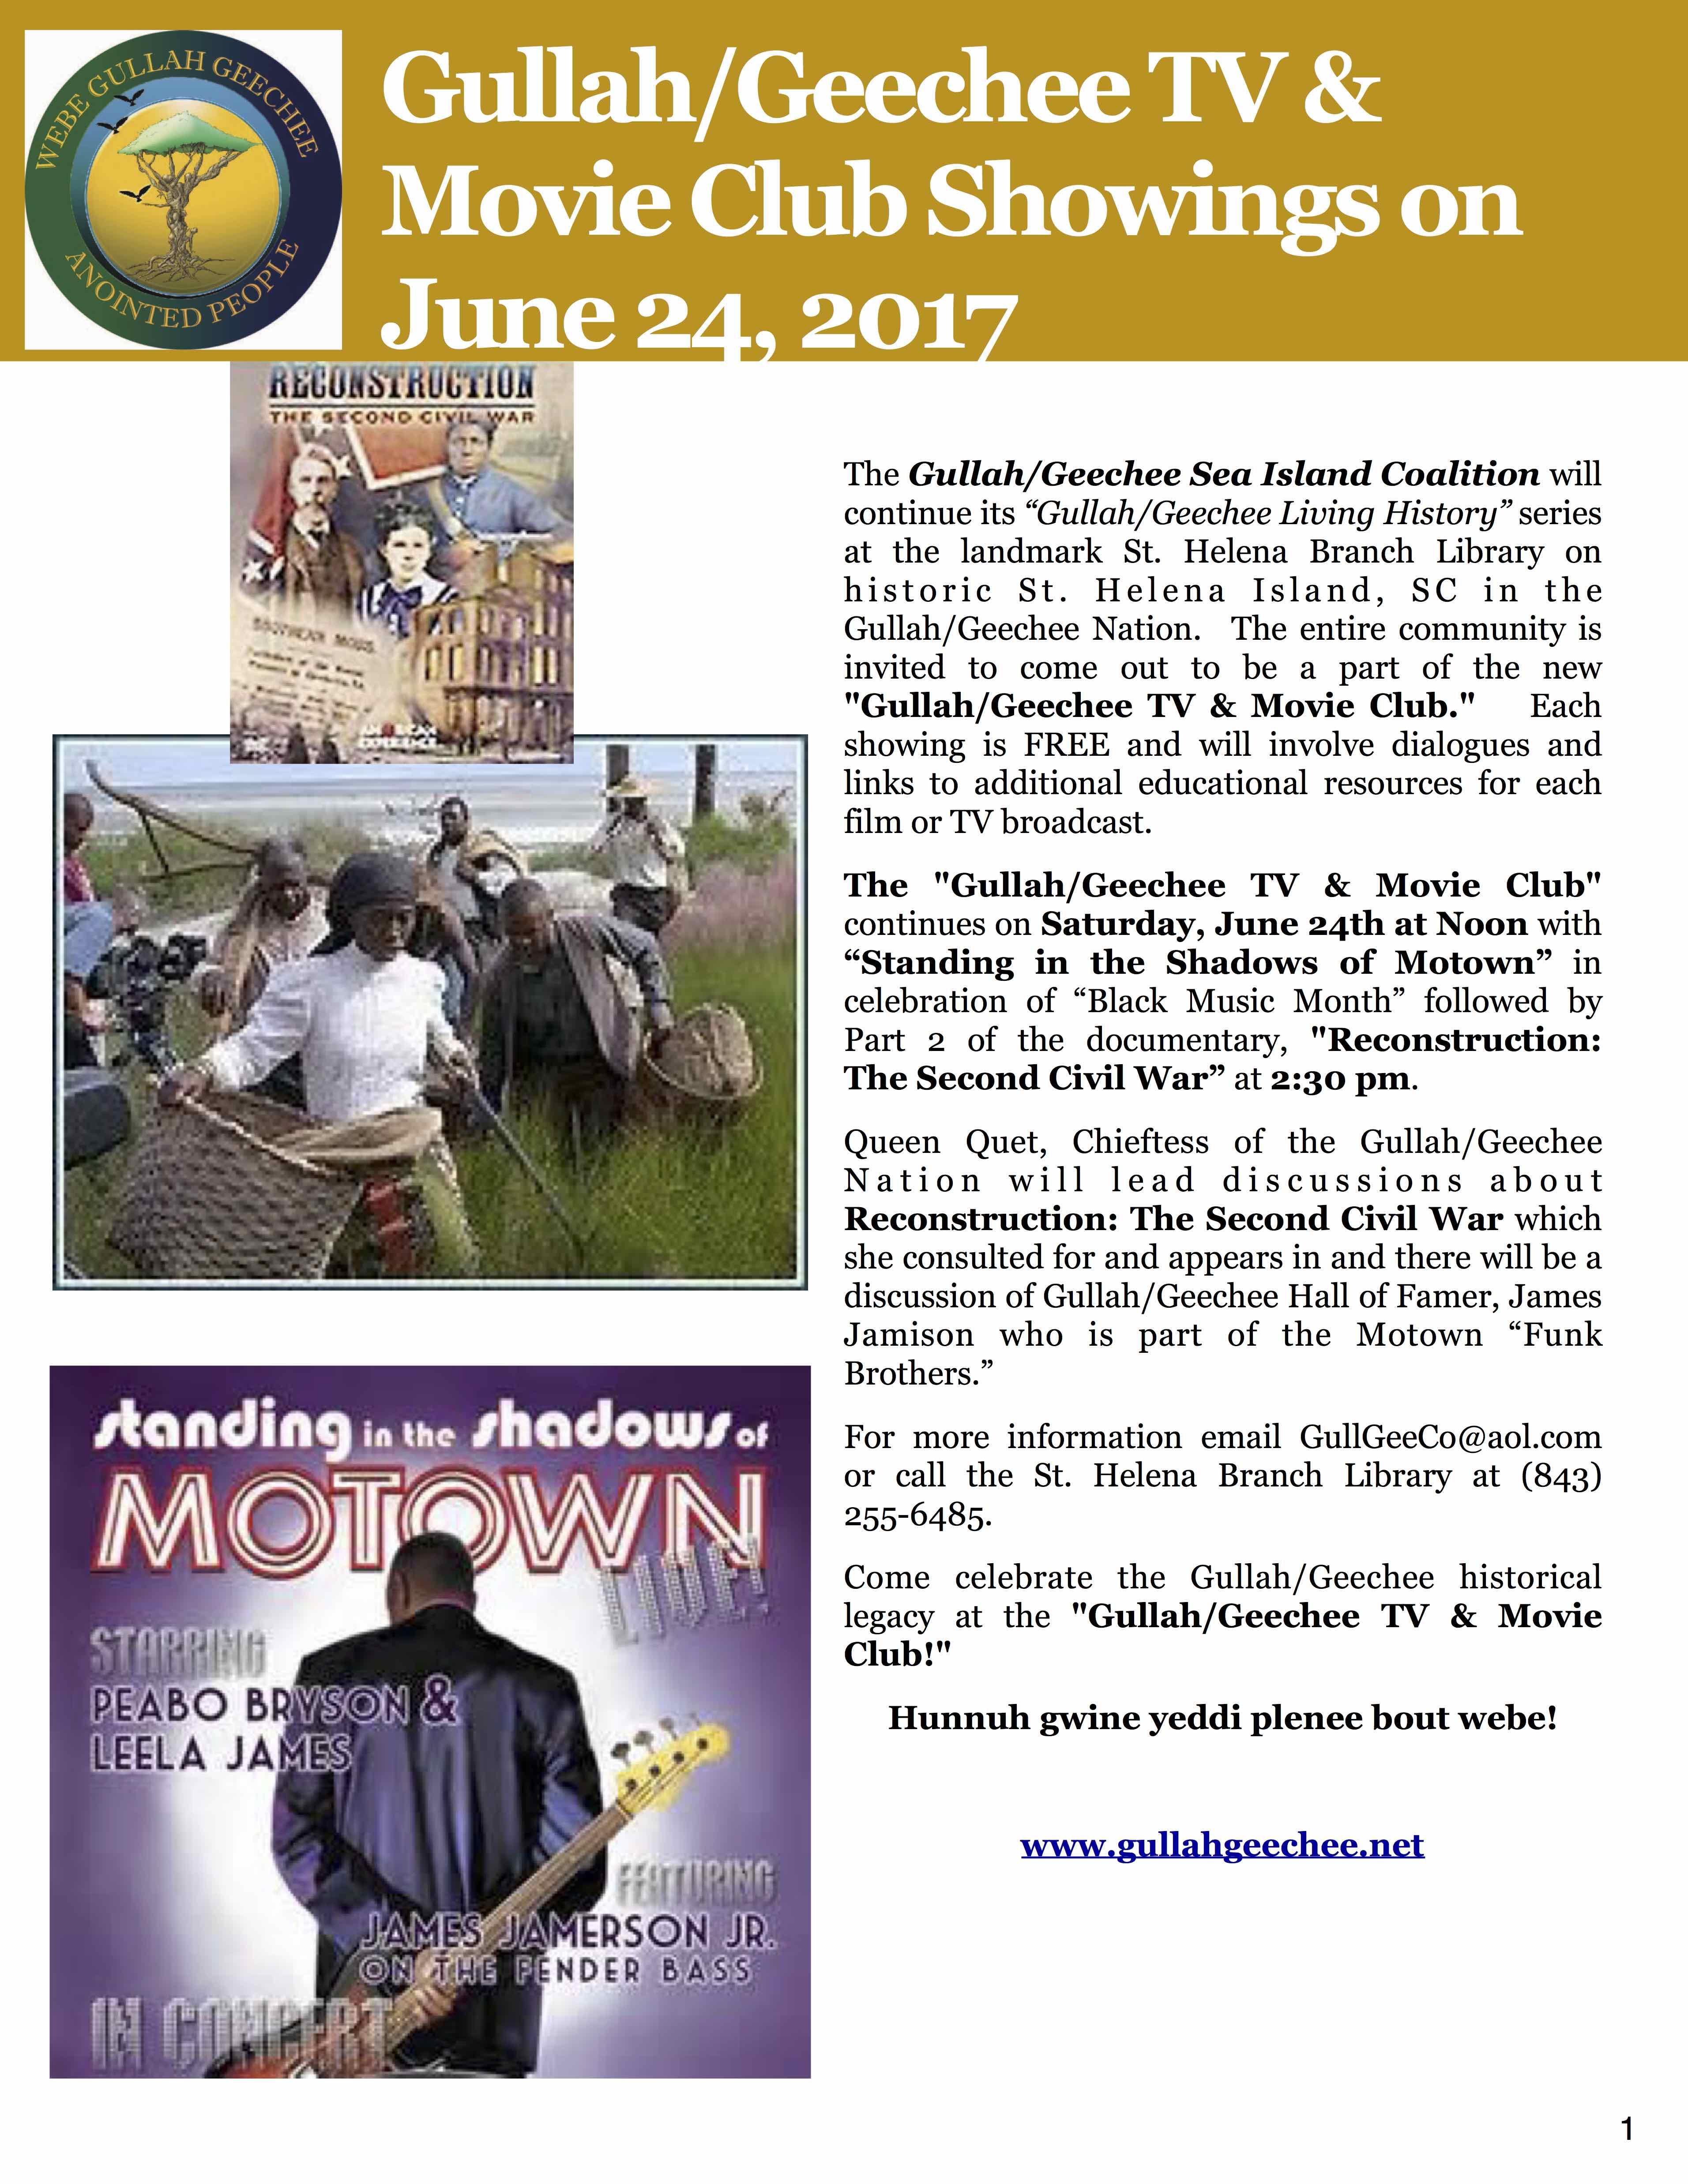 Gullah/Geechee TV & Movie Club: Standing in the Shadows of Motown